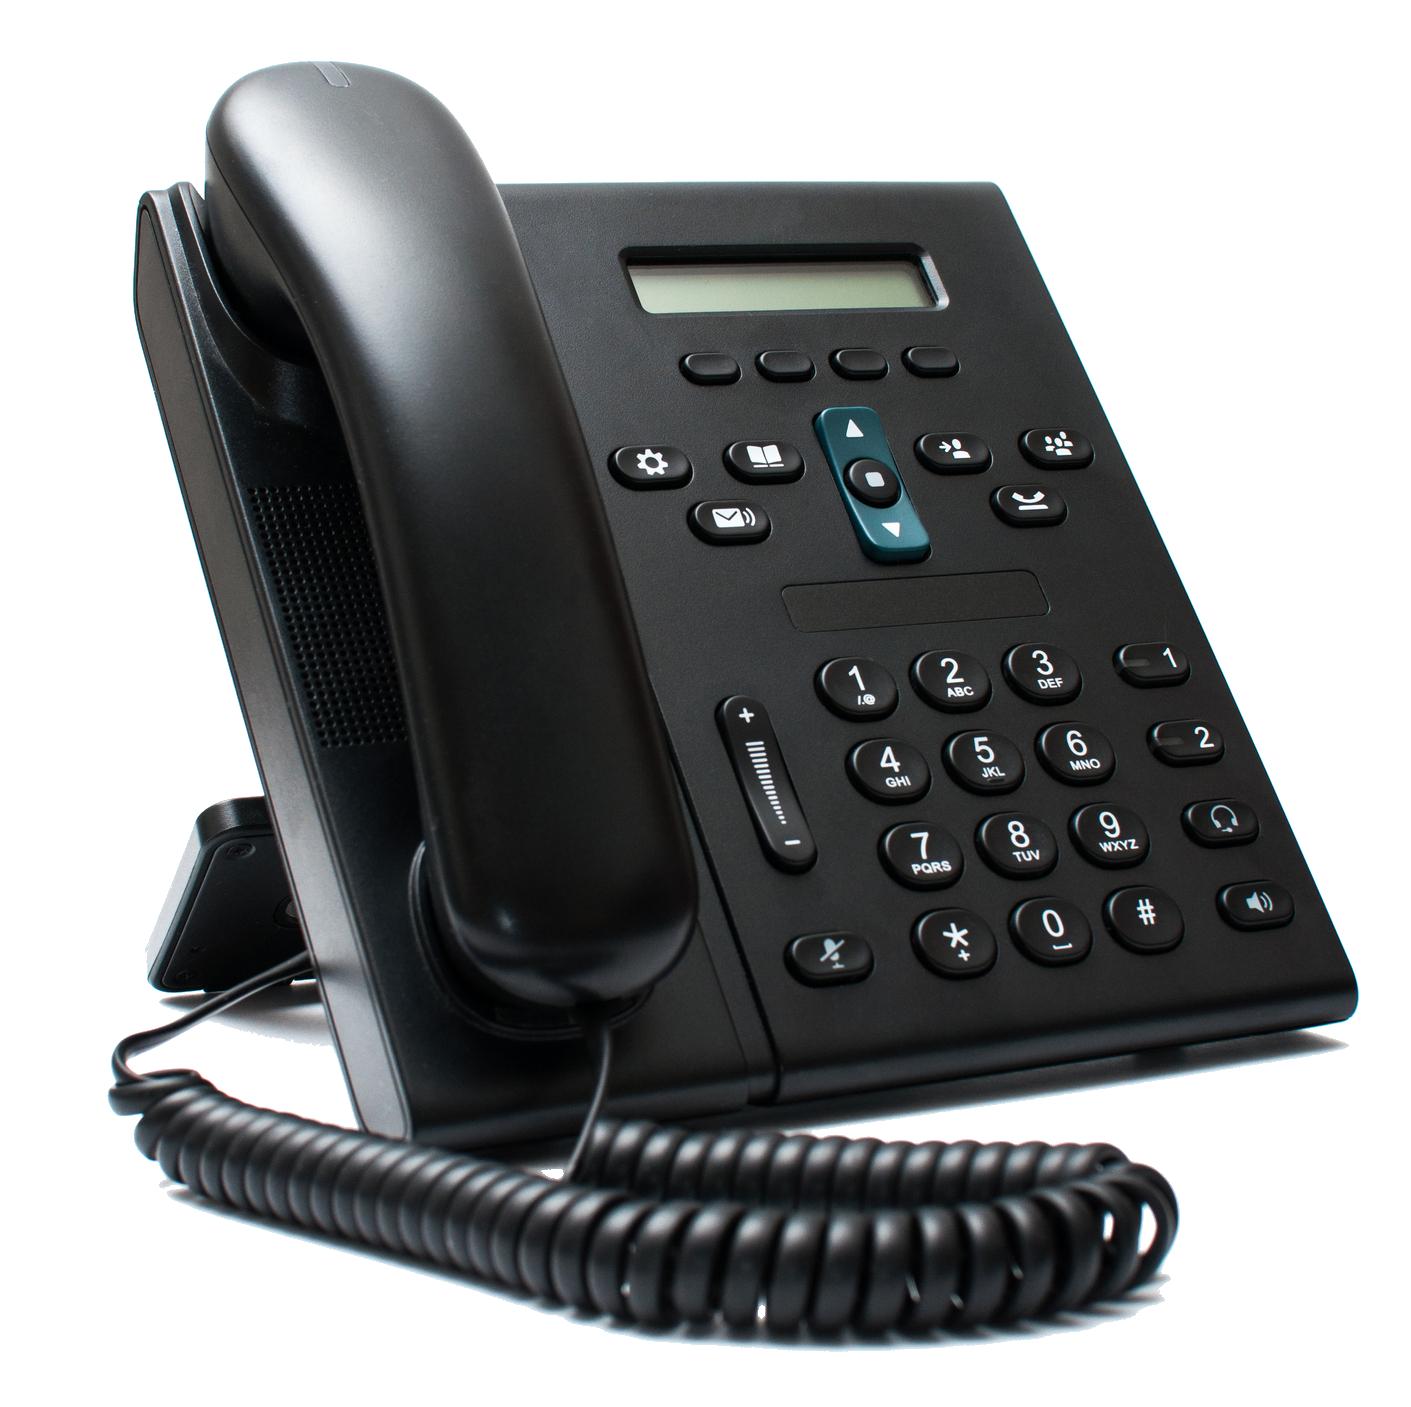 Deskphone Onpremis Gateway 2